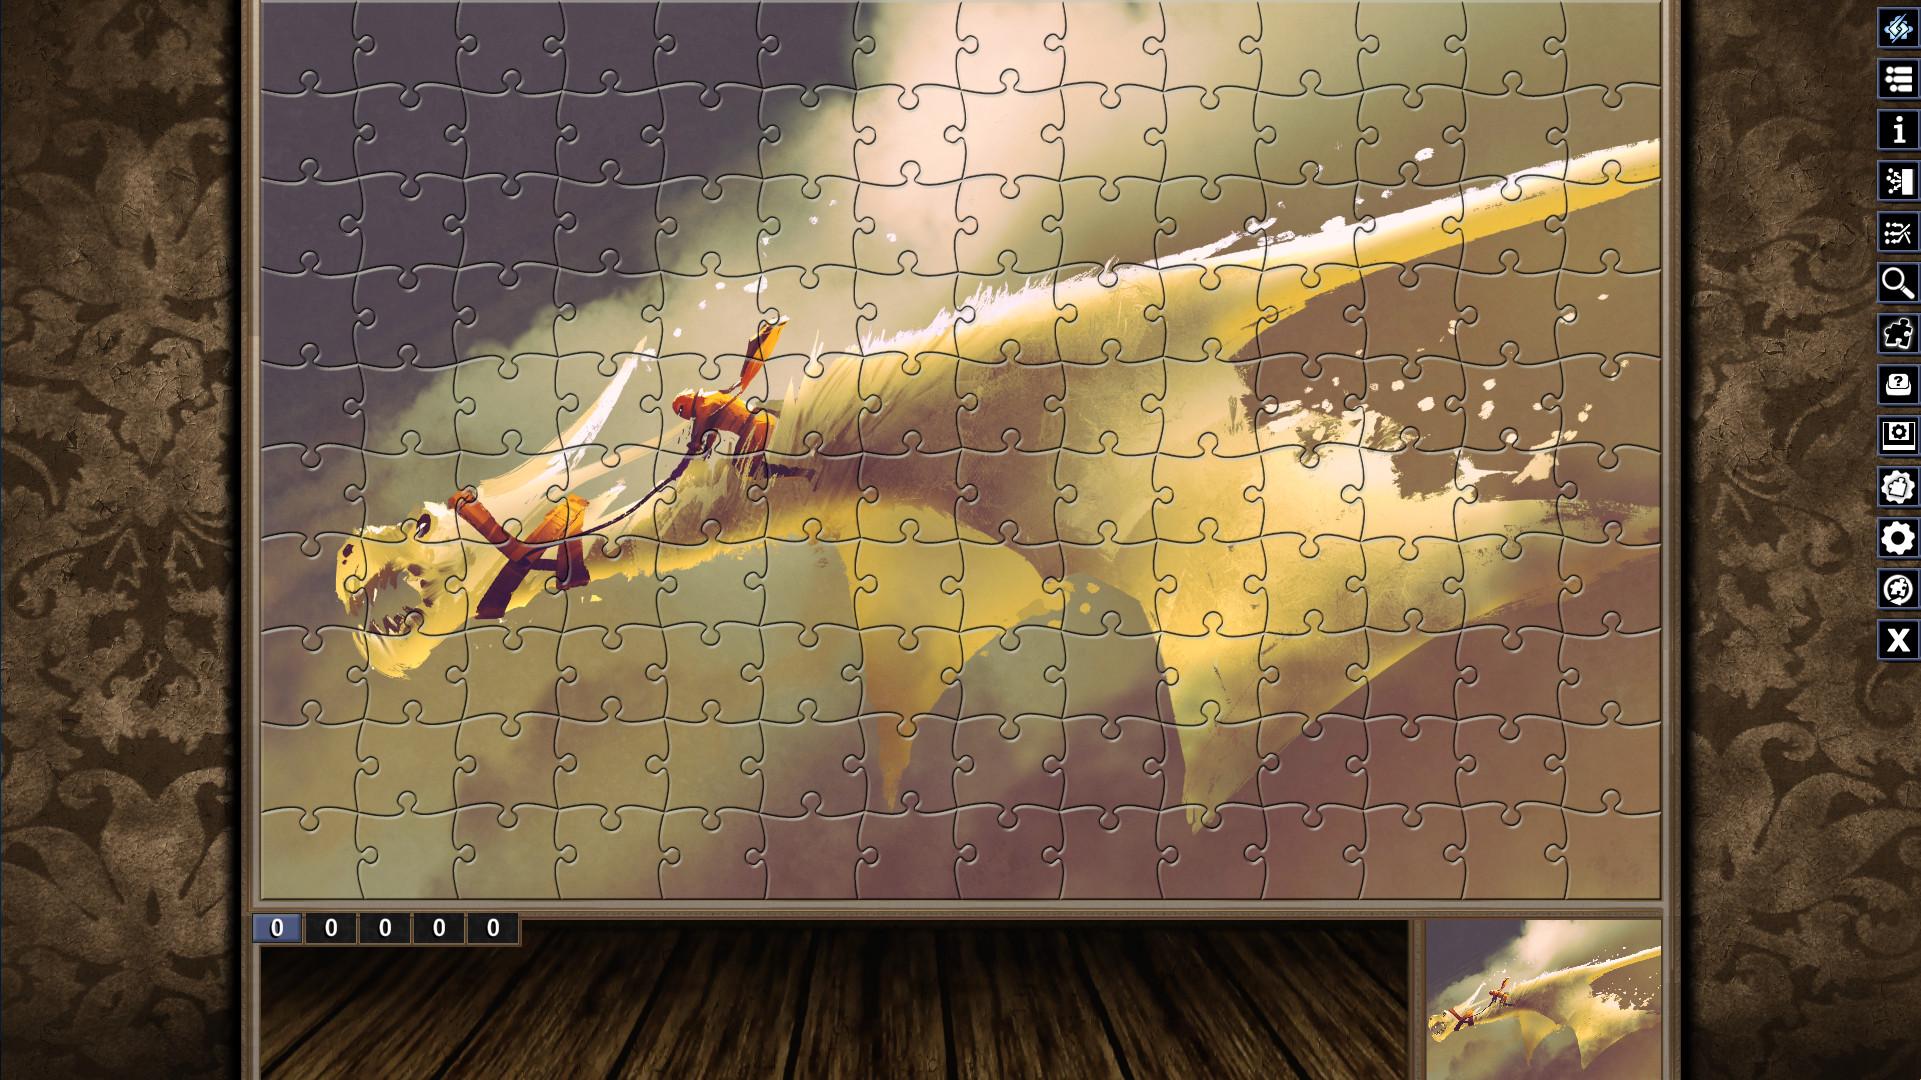 Pixel Puzzles Illustrations & Anime - Jigsaw Pack: Legendary Beasts screenshot